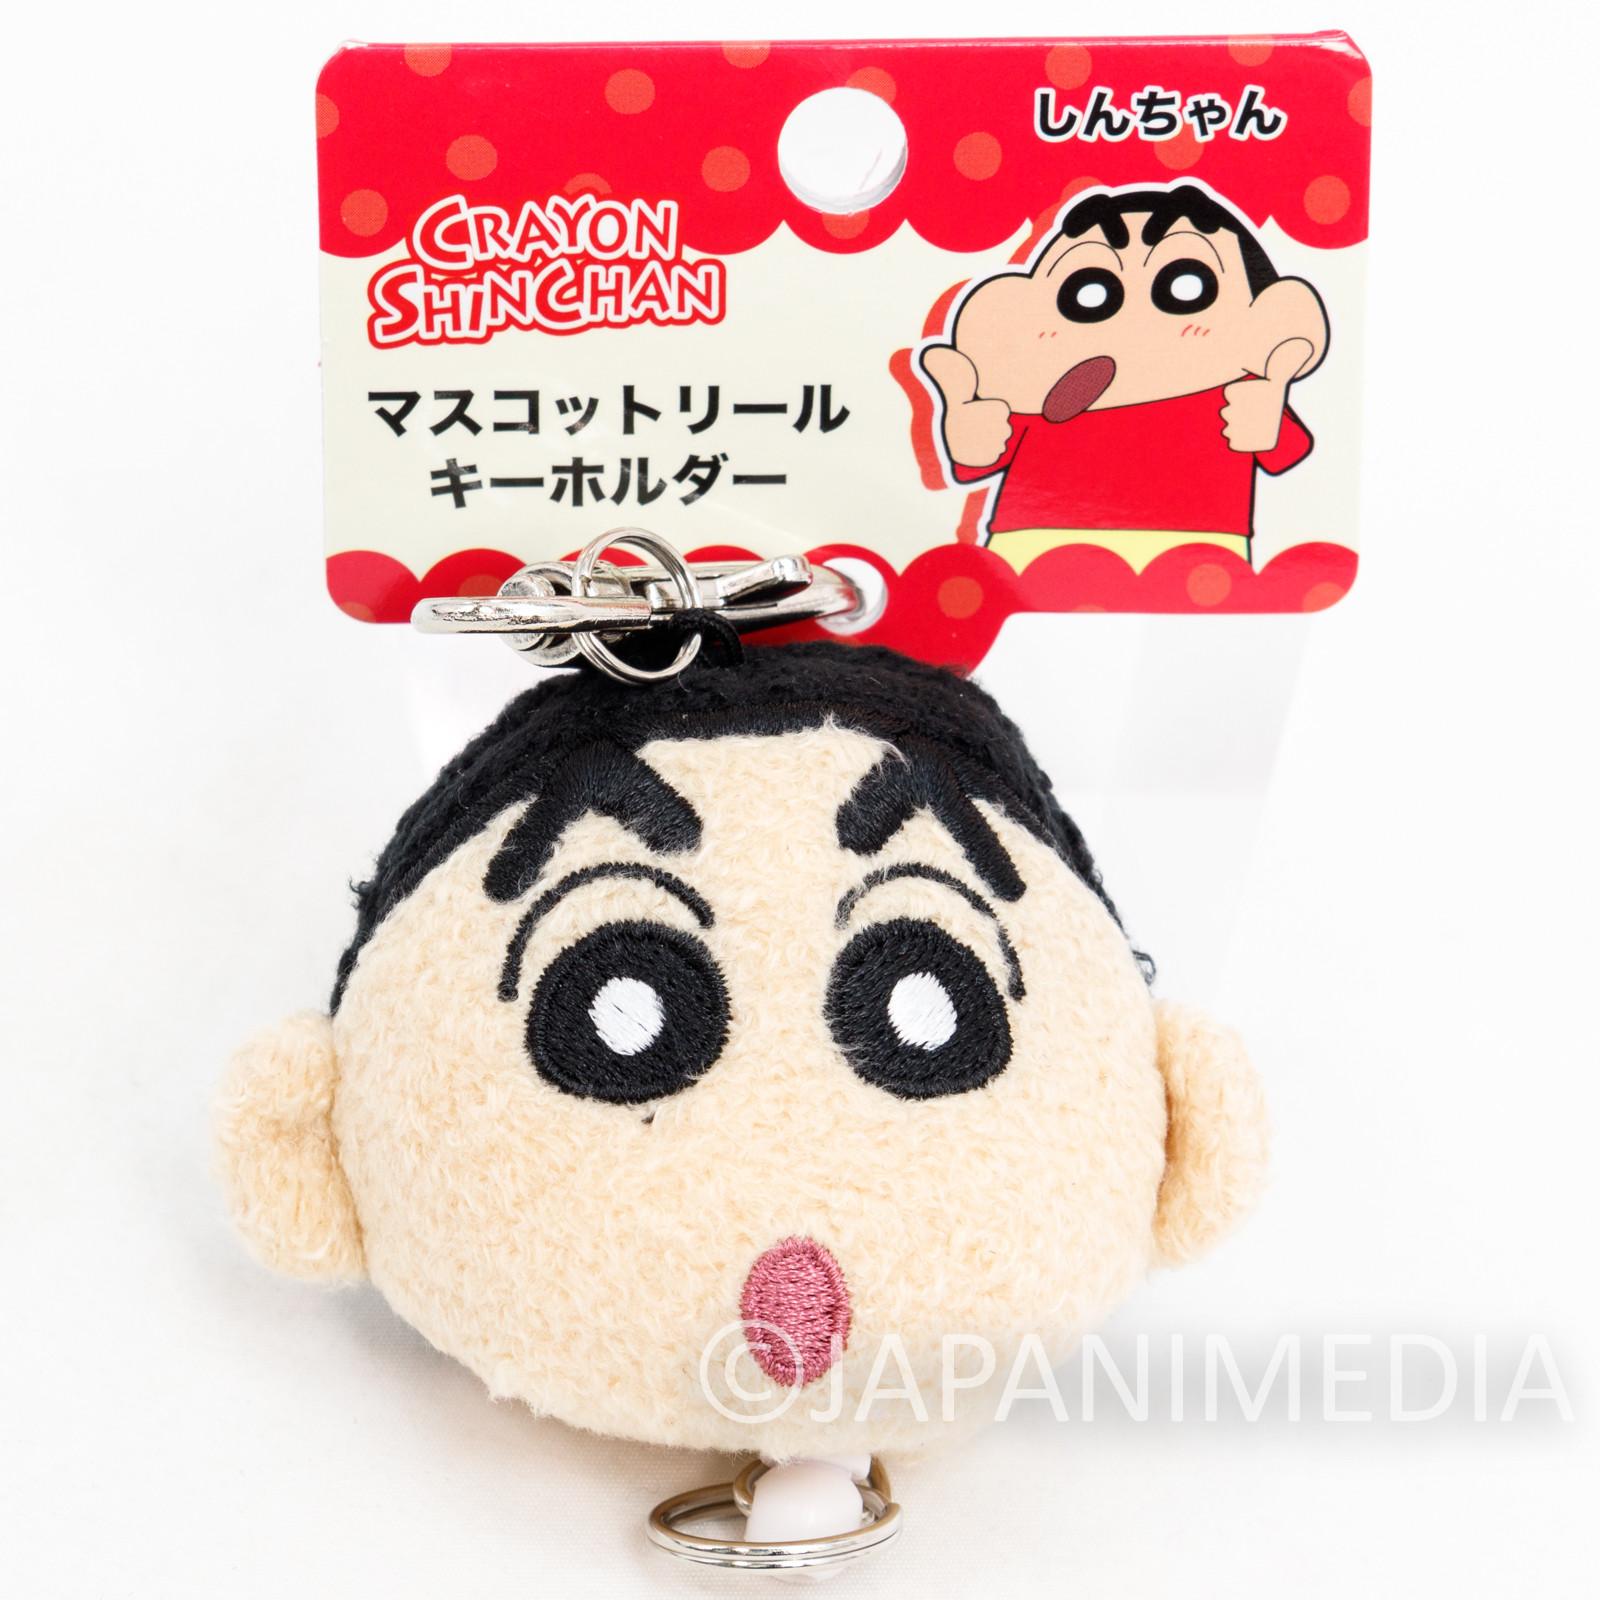 Crayon Shin-chan Plush Doll Mascot Reel Keychain JAPAN ANIME